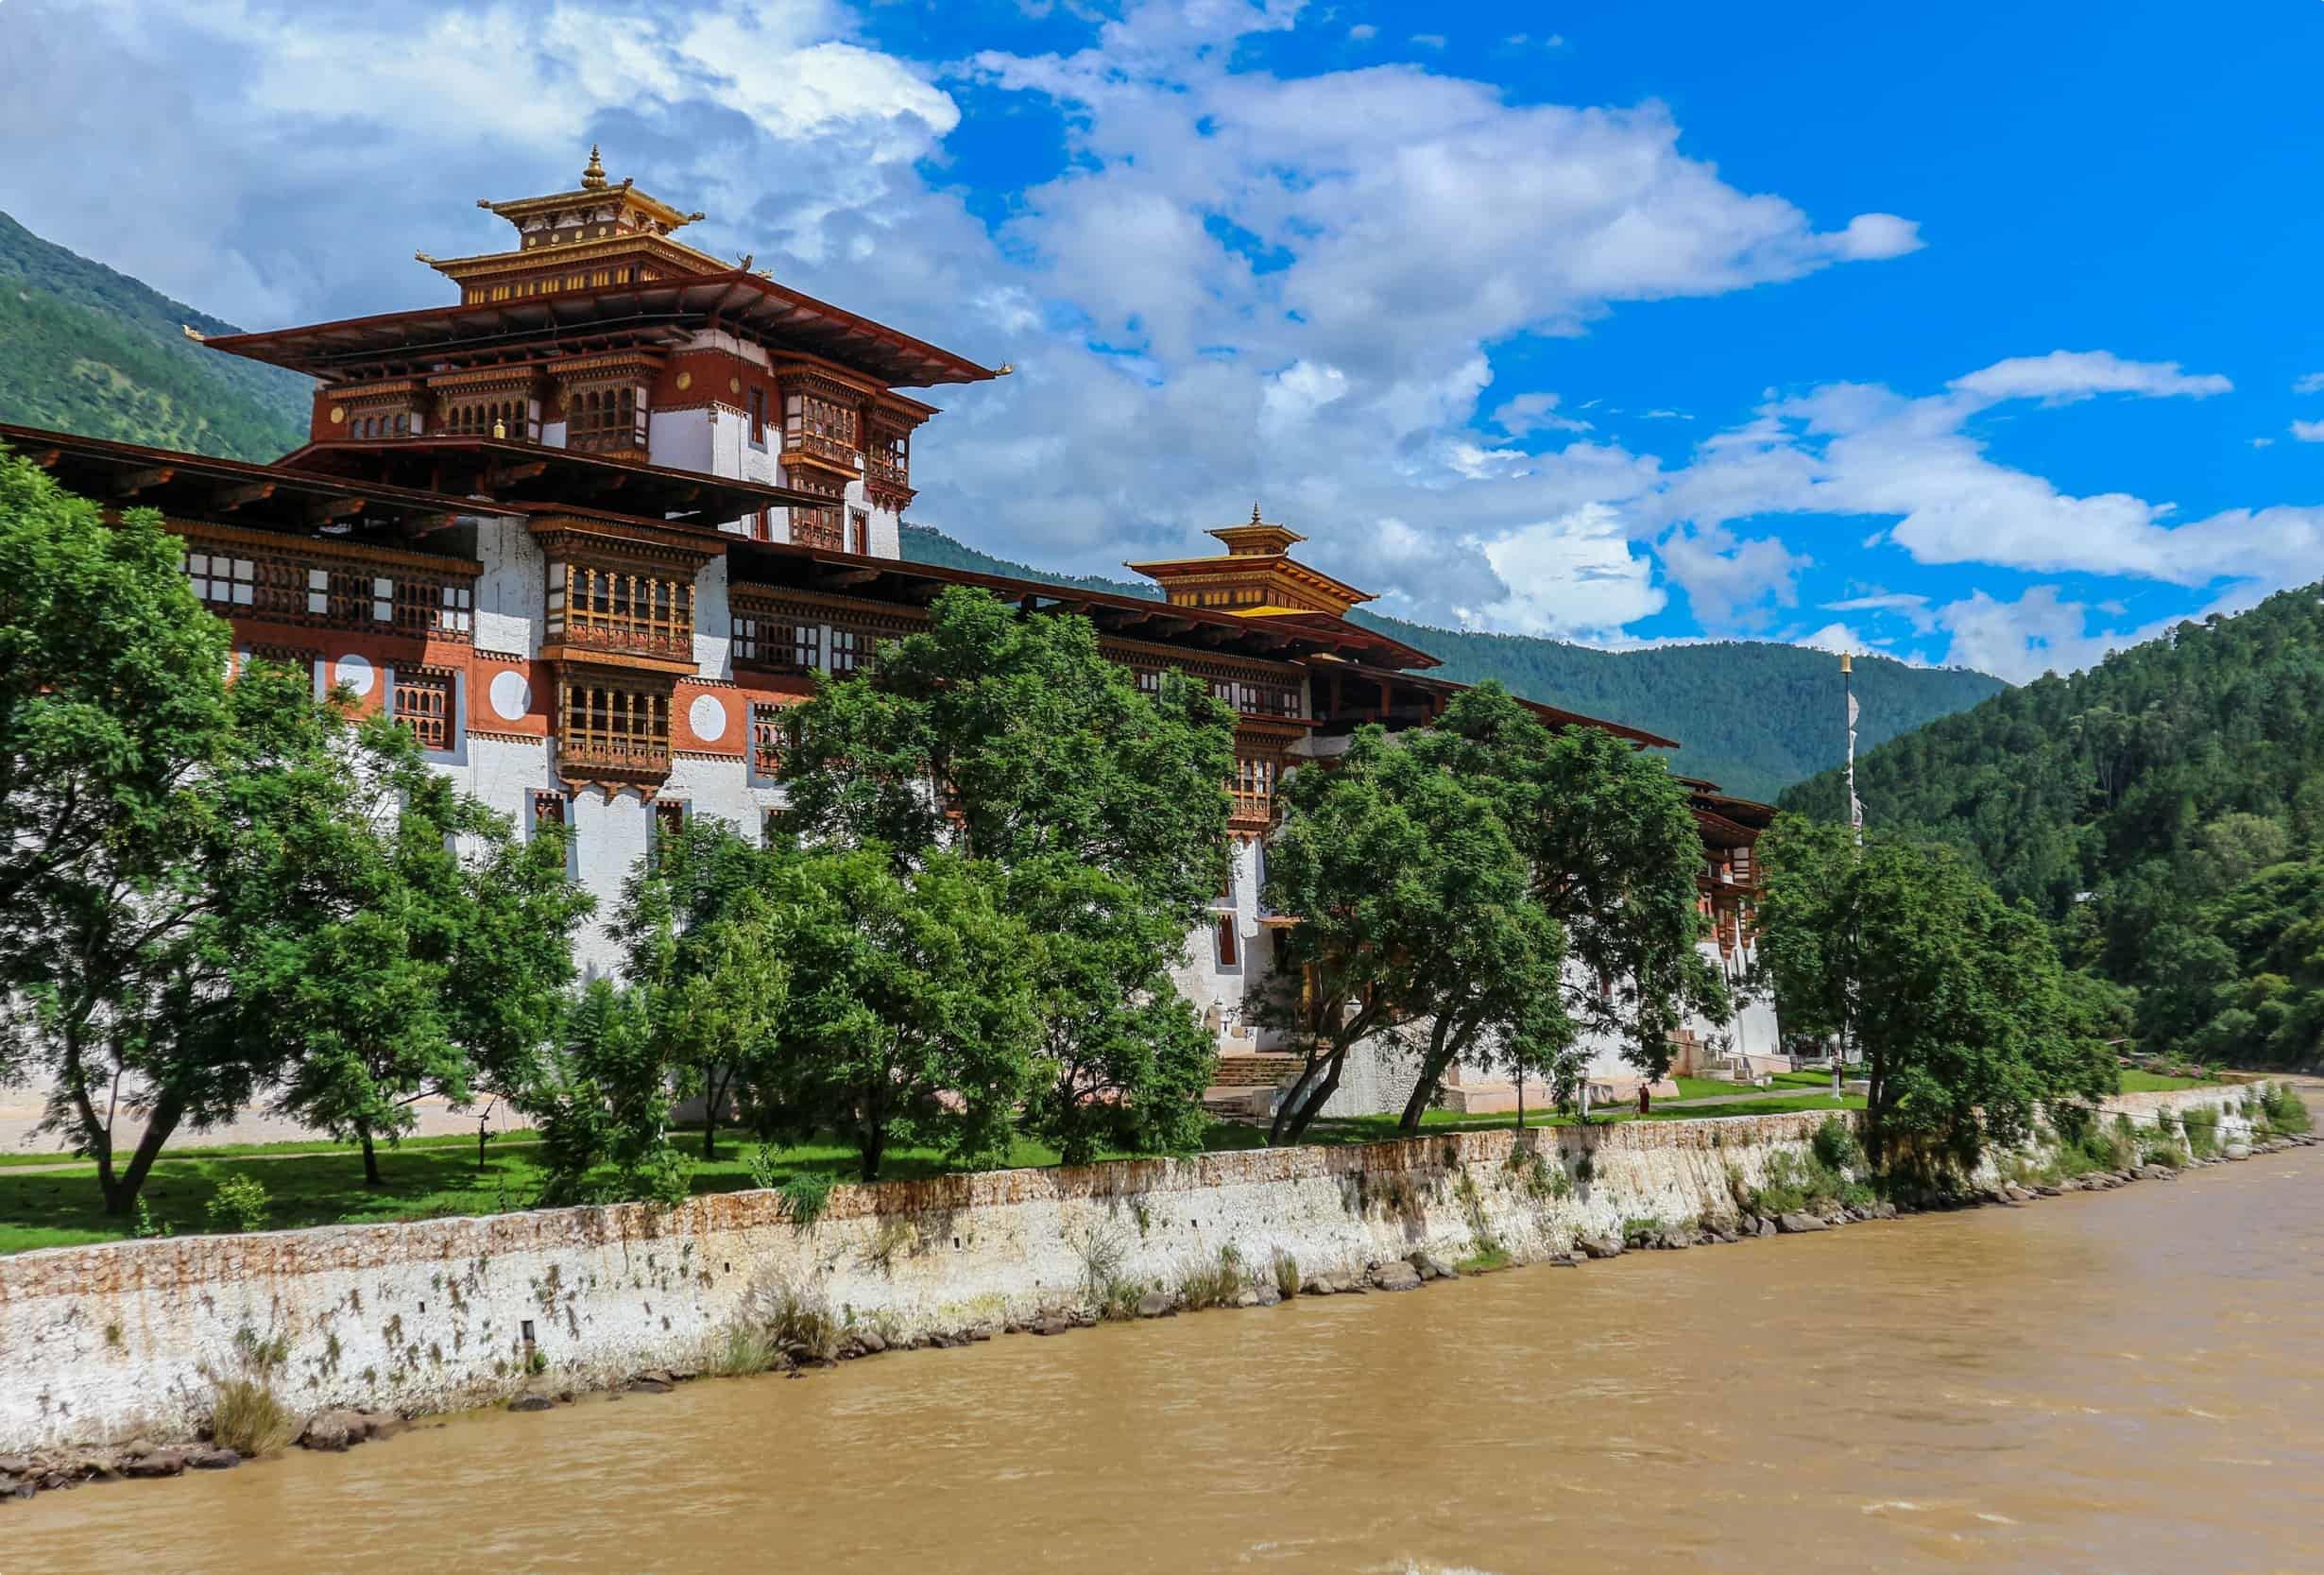 Punakha Dzong Temple (Pungthang Dechen Phodrang Dzong - Palace of Great Happiness), Bhutan. Punakha Dzong located on the river bank of ancient capital of Bhutan